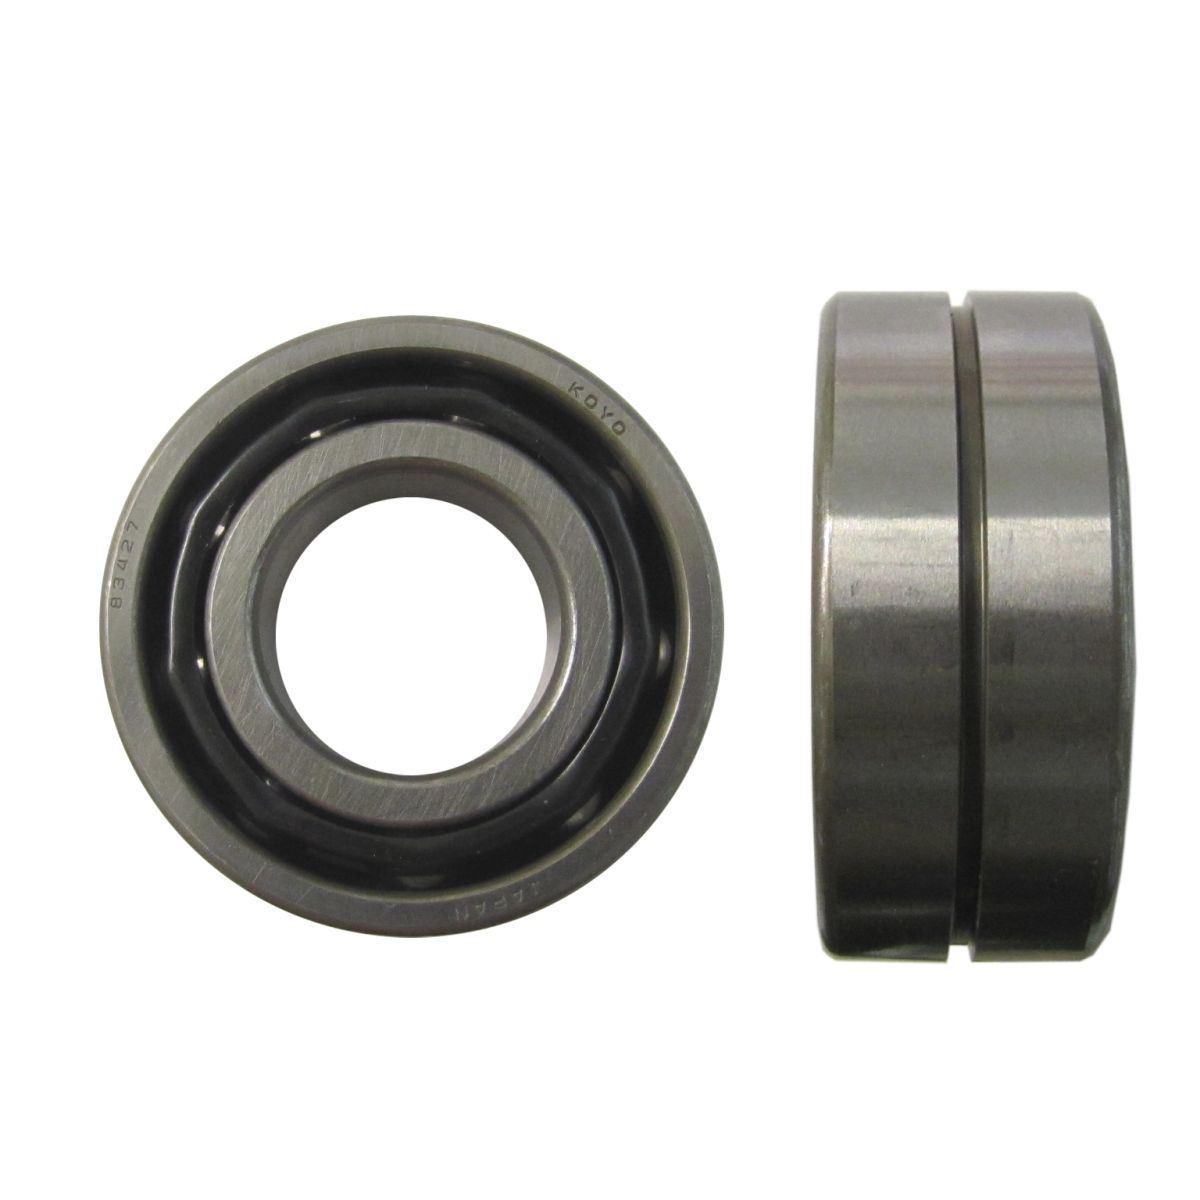 Bearing Koyo 83427 (I D 25mm x O D 52mm x W 20 40mm Grooved)